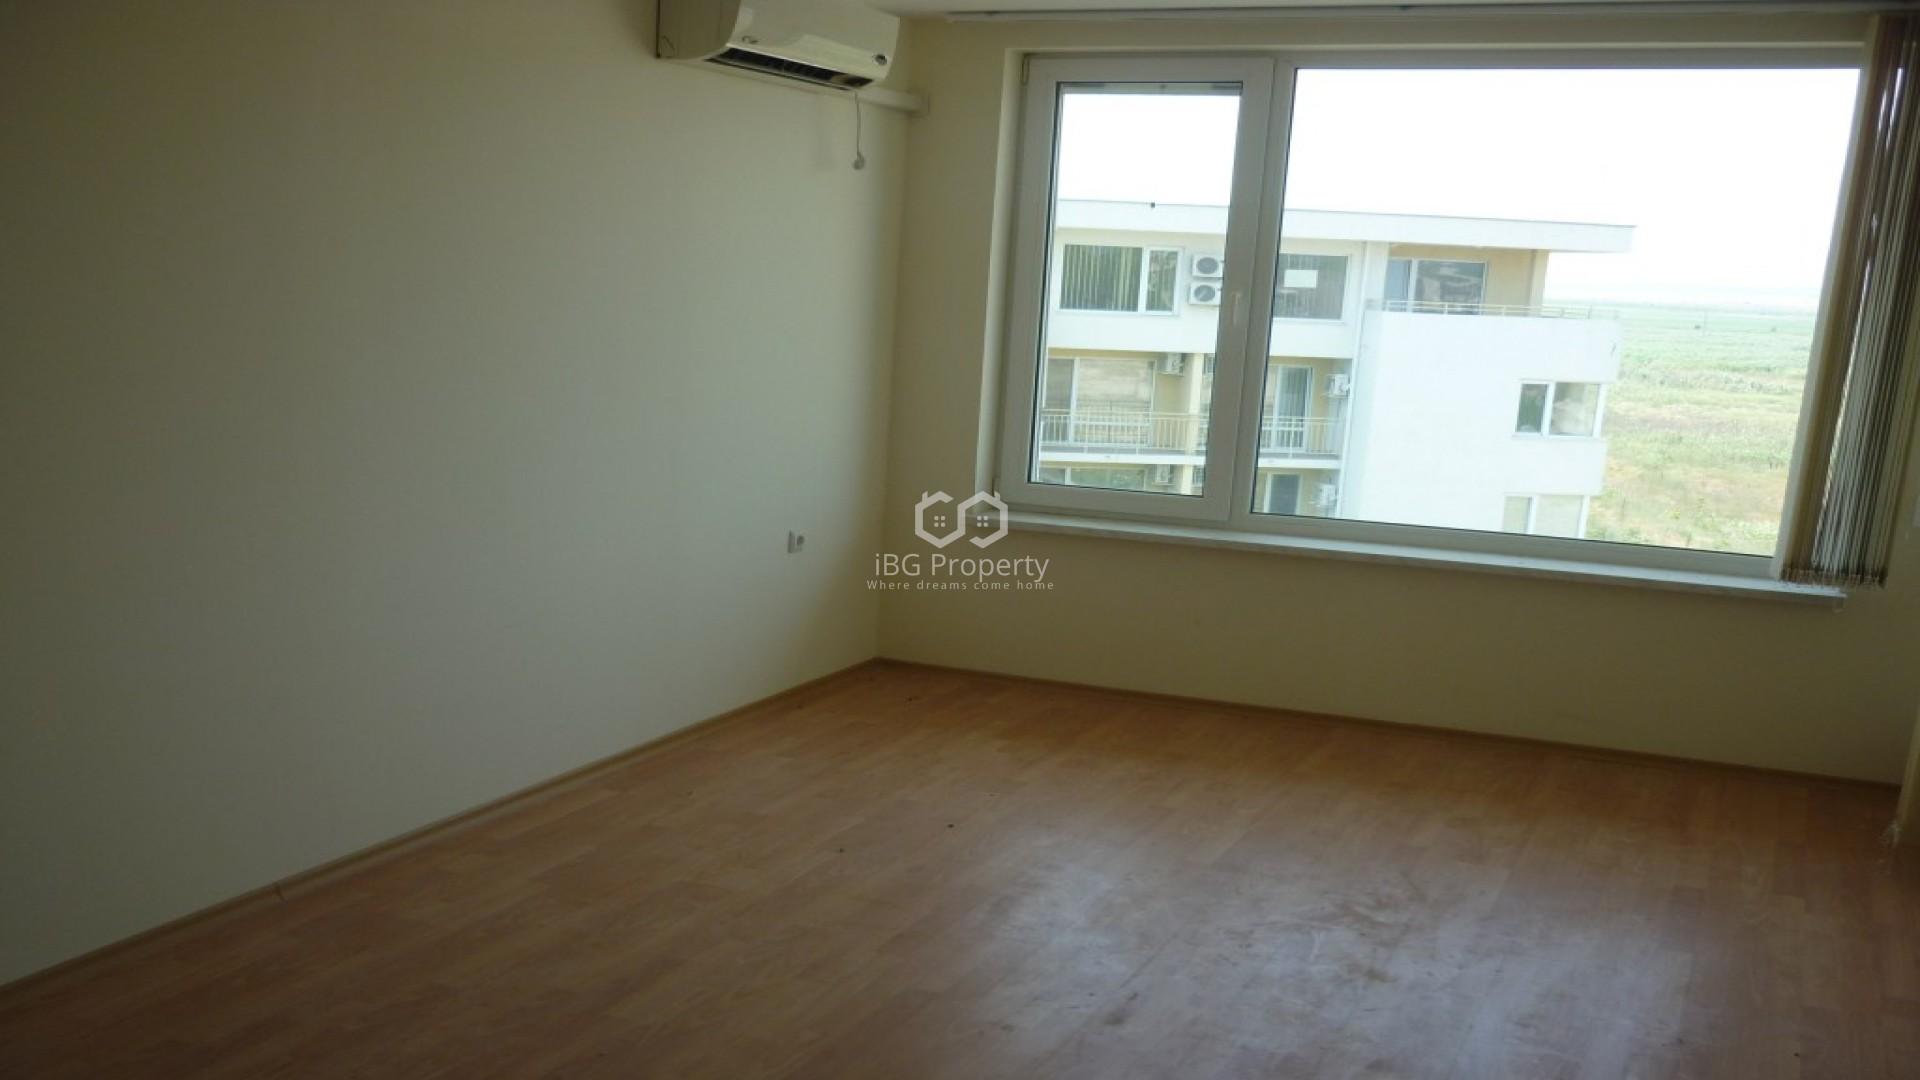 Tристаен апартамент Слънчев Бряг 85 m2